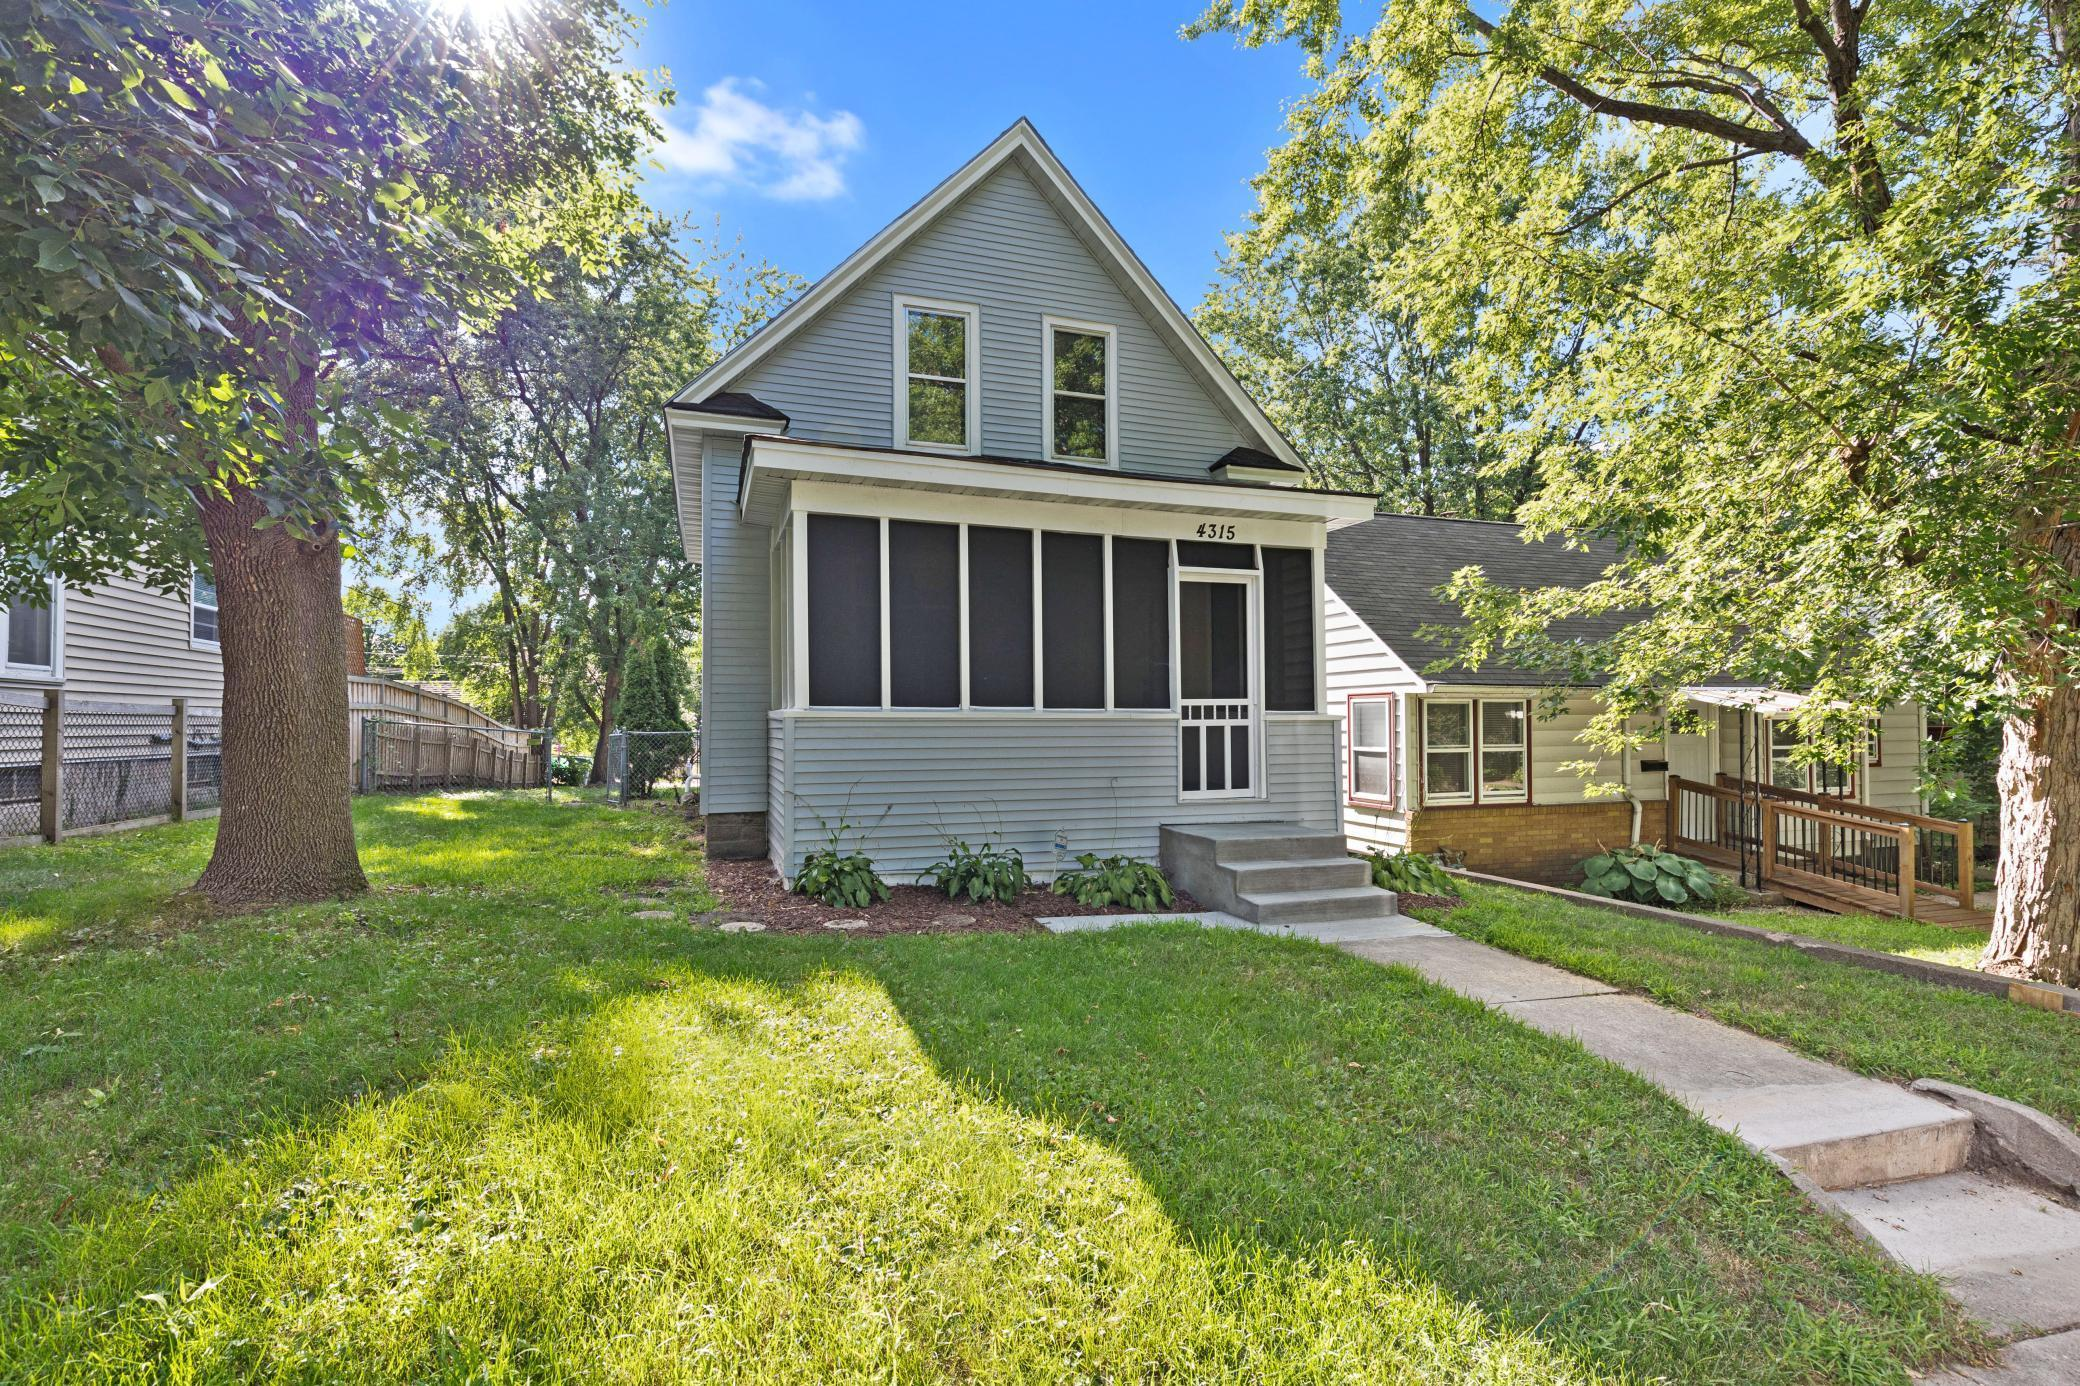 4315 Fremont Avenue, Minneapolis, Minnesota 55412, 2 Bedrooms Bedrooms, ,1 BathroomBathrooms,Residential,For Sale,Fremont,NST5633927